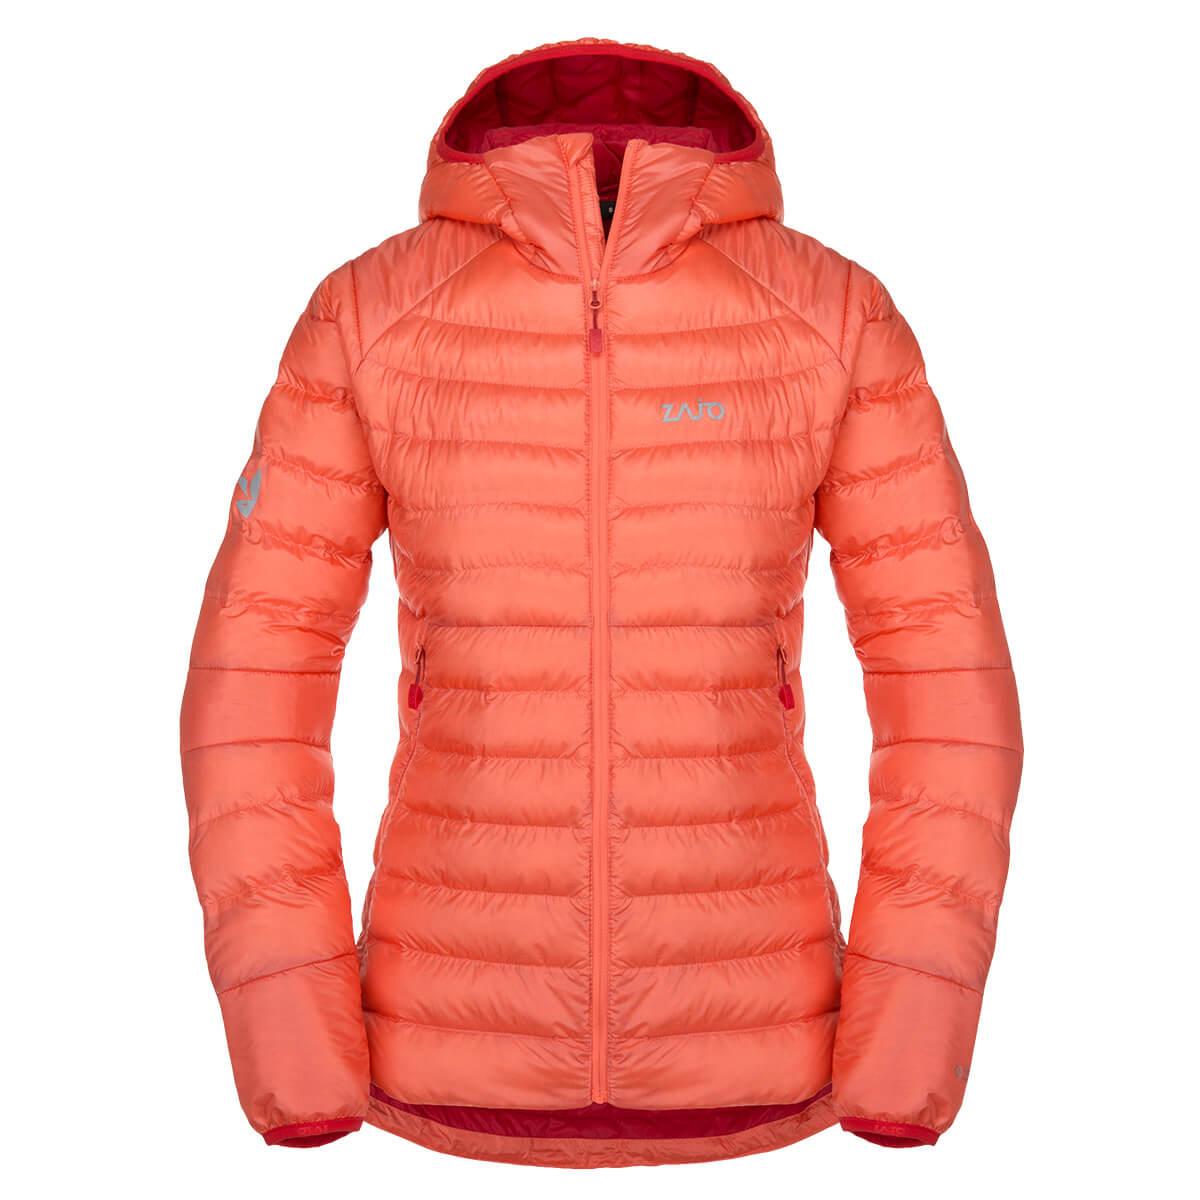 Dámska bunda Zajo Livigno W JKT Rose Orange - veľkosť XS